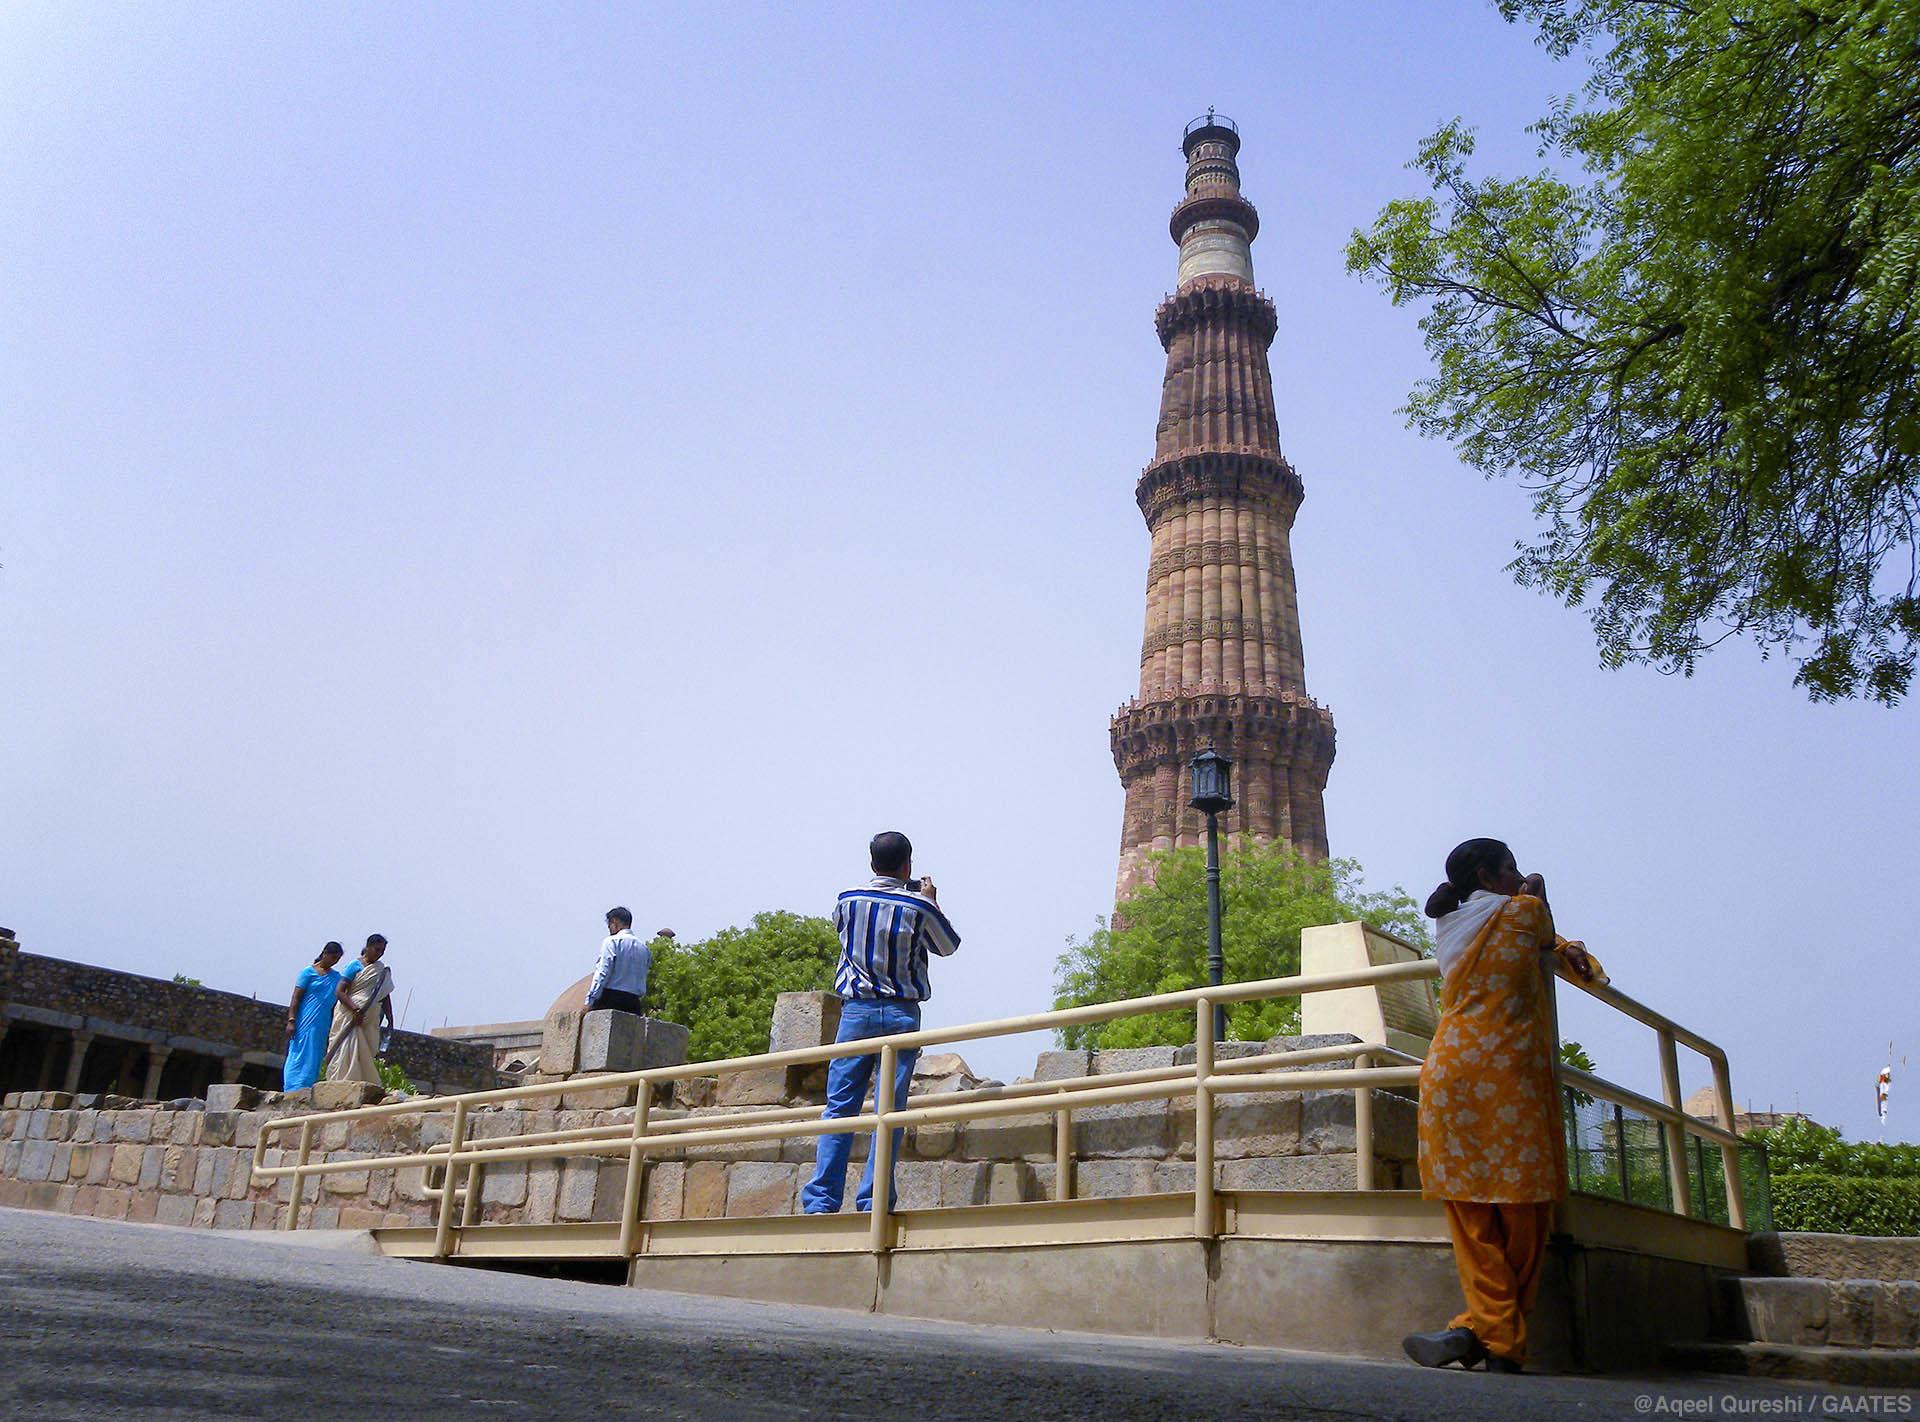 Ramp at Qutub Minar